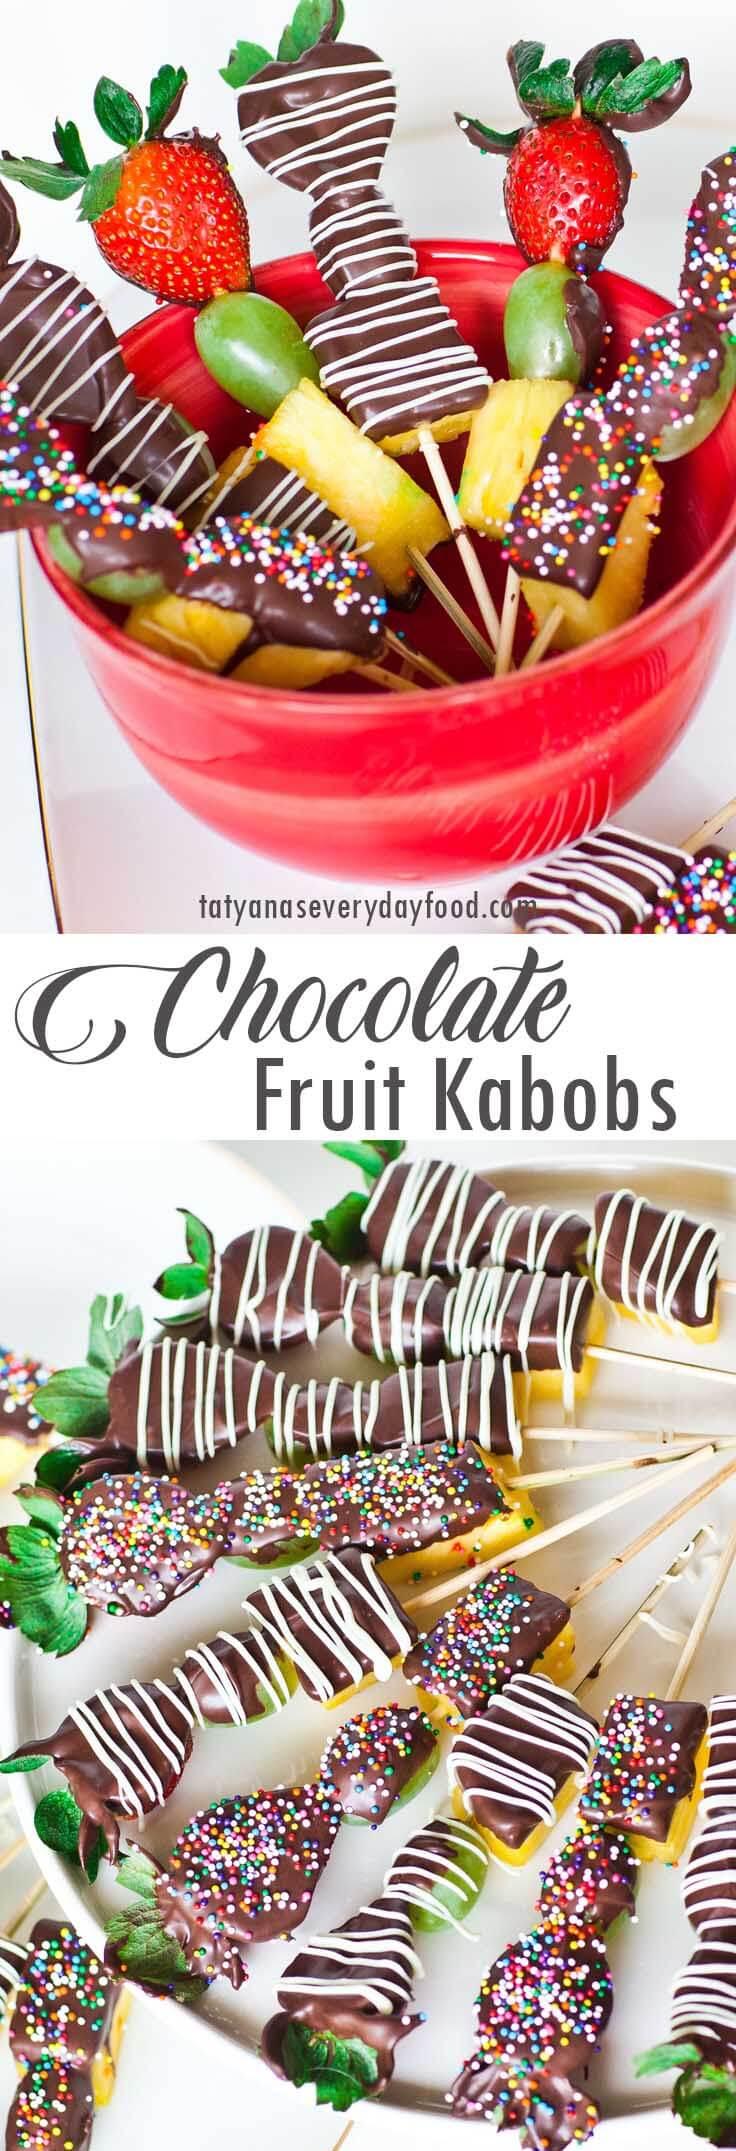 Chocolate Fruit Kabobs video recipe